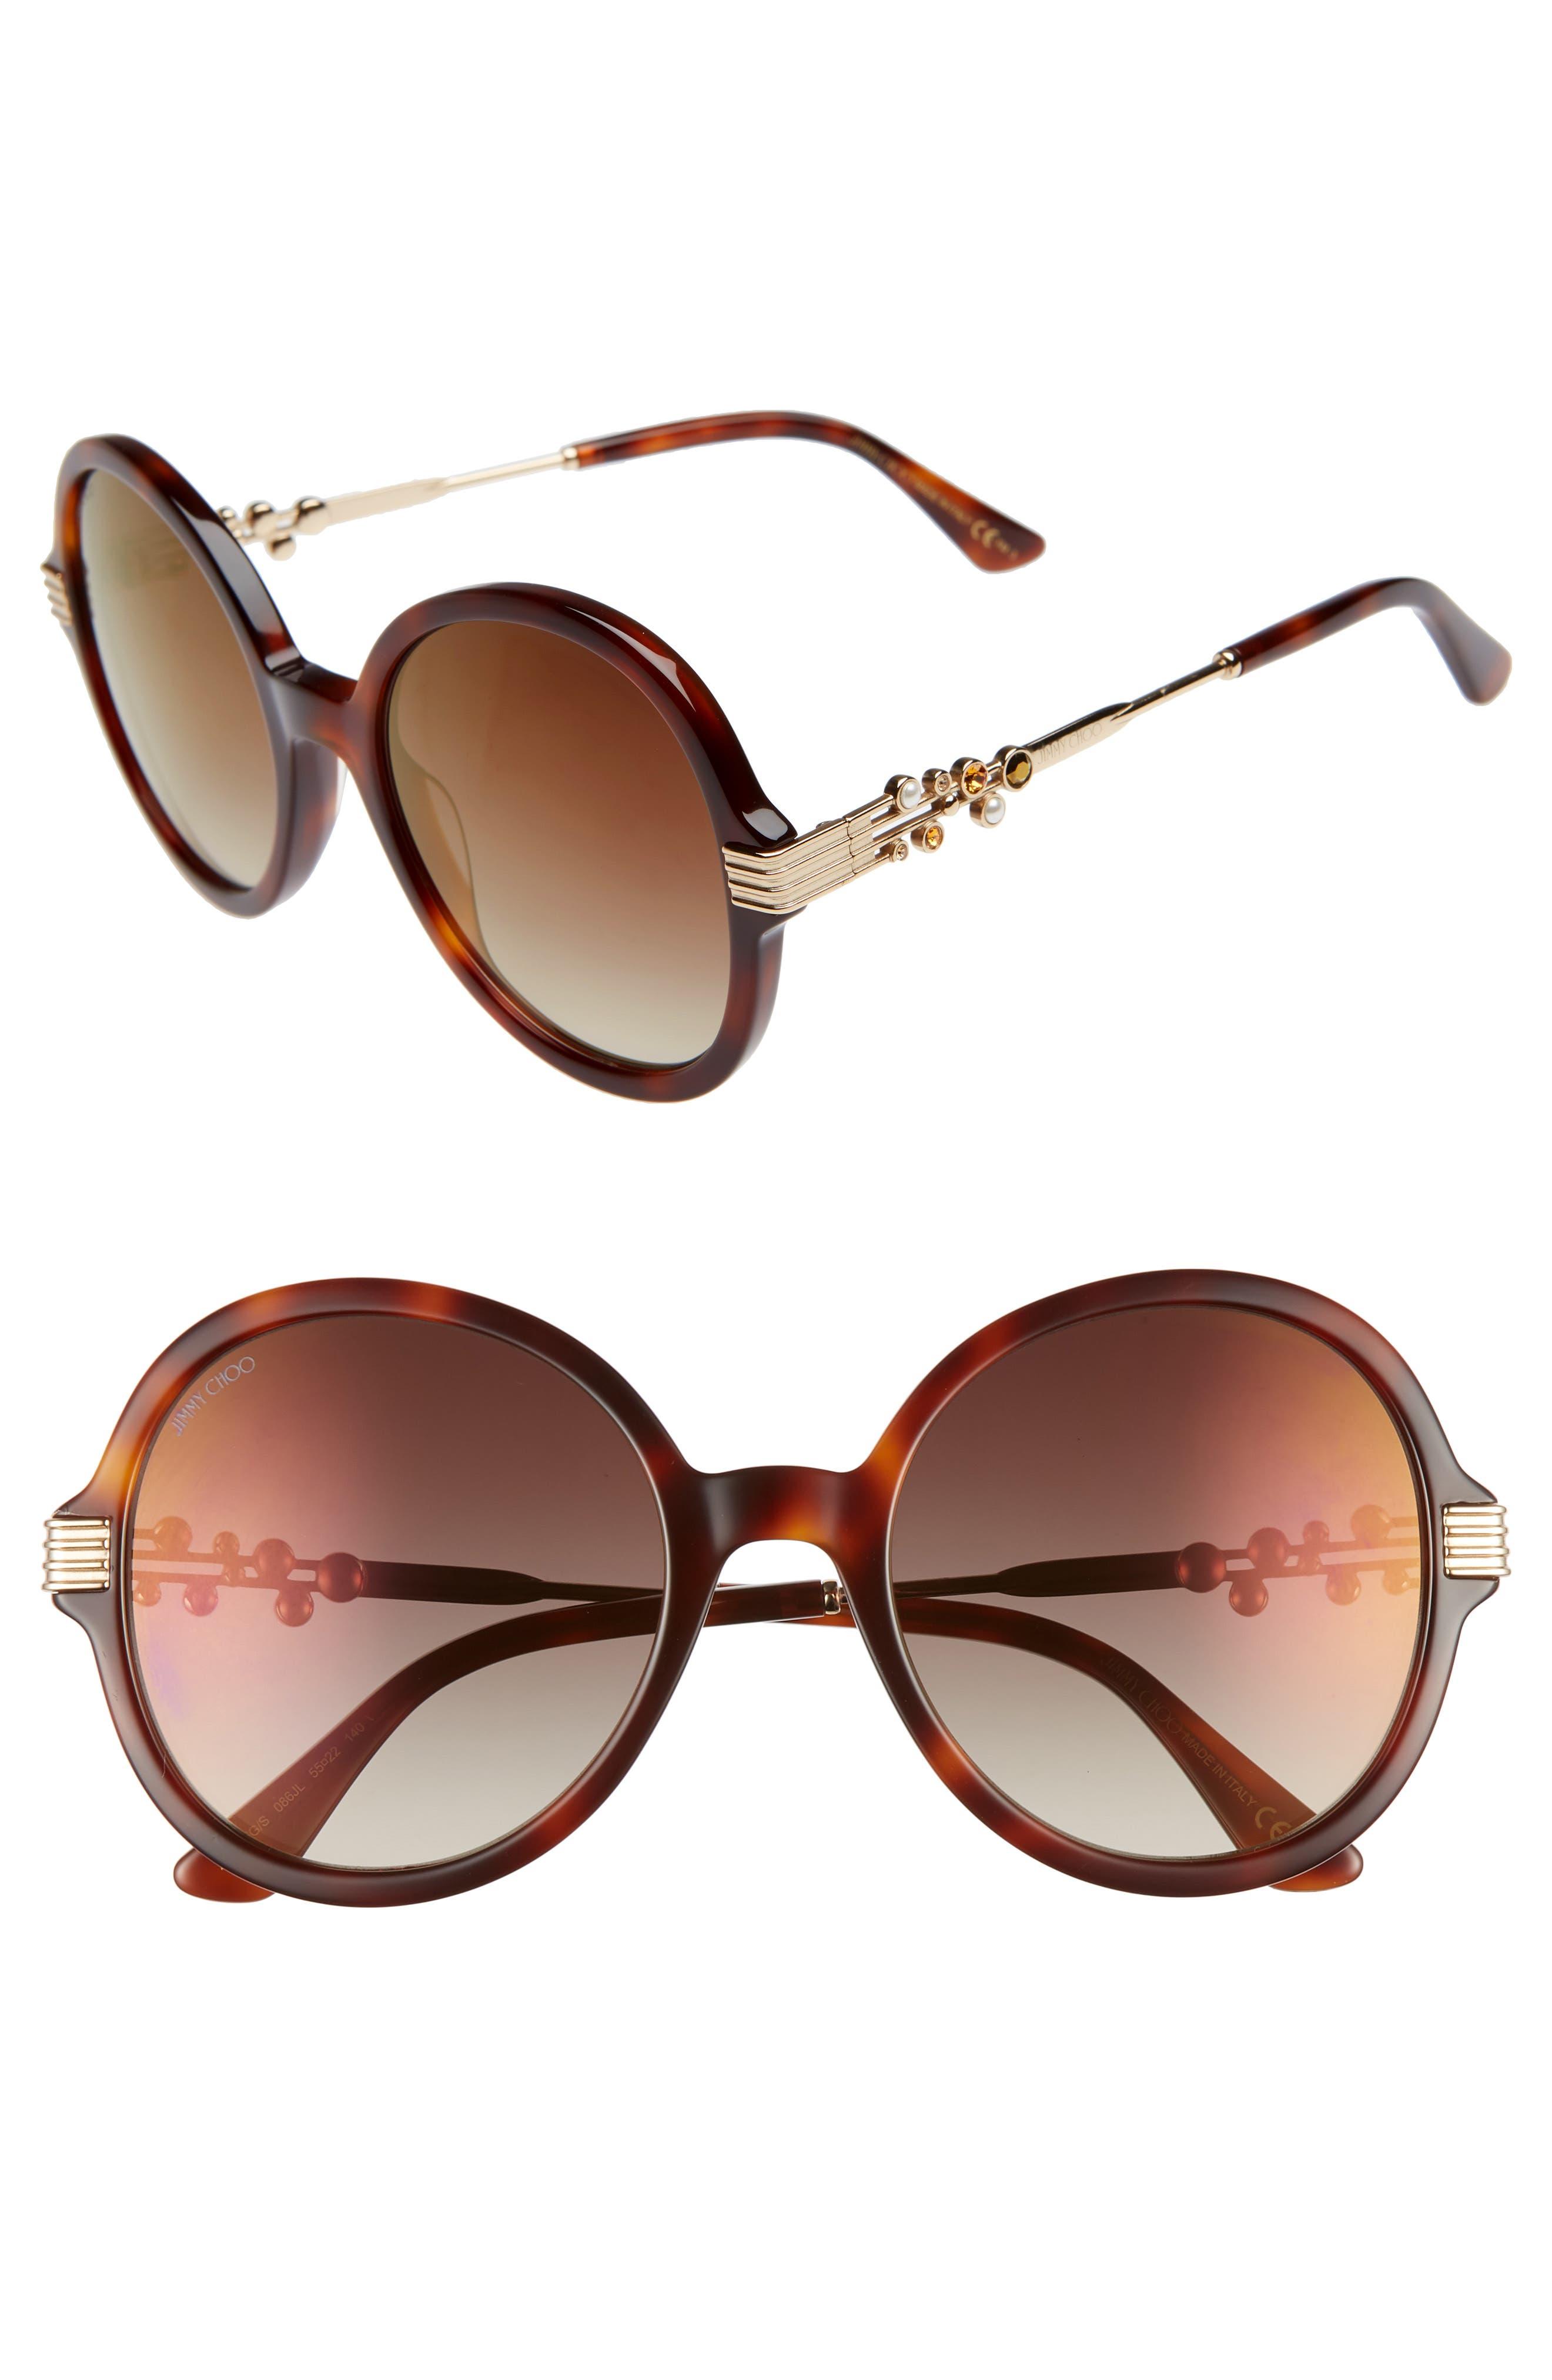 06dcb69ab975 Jimmy Choo Sunglasses for Women